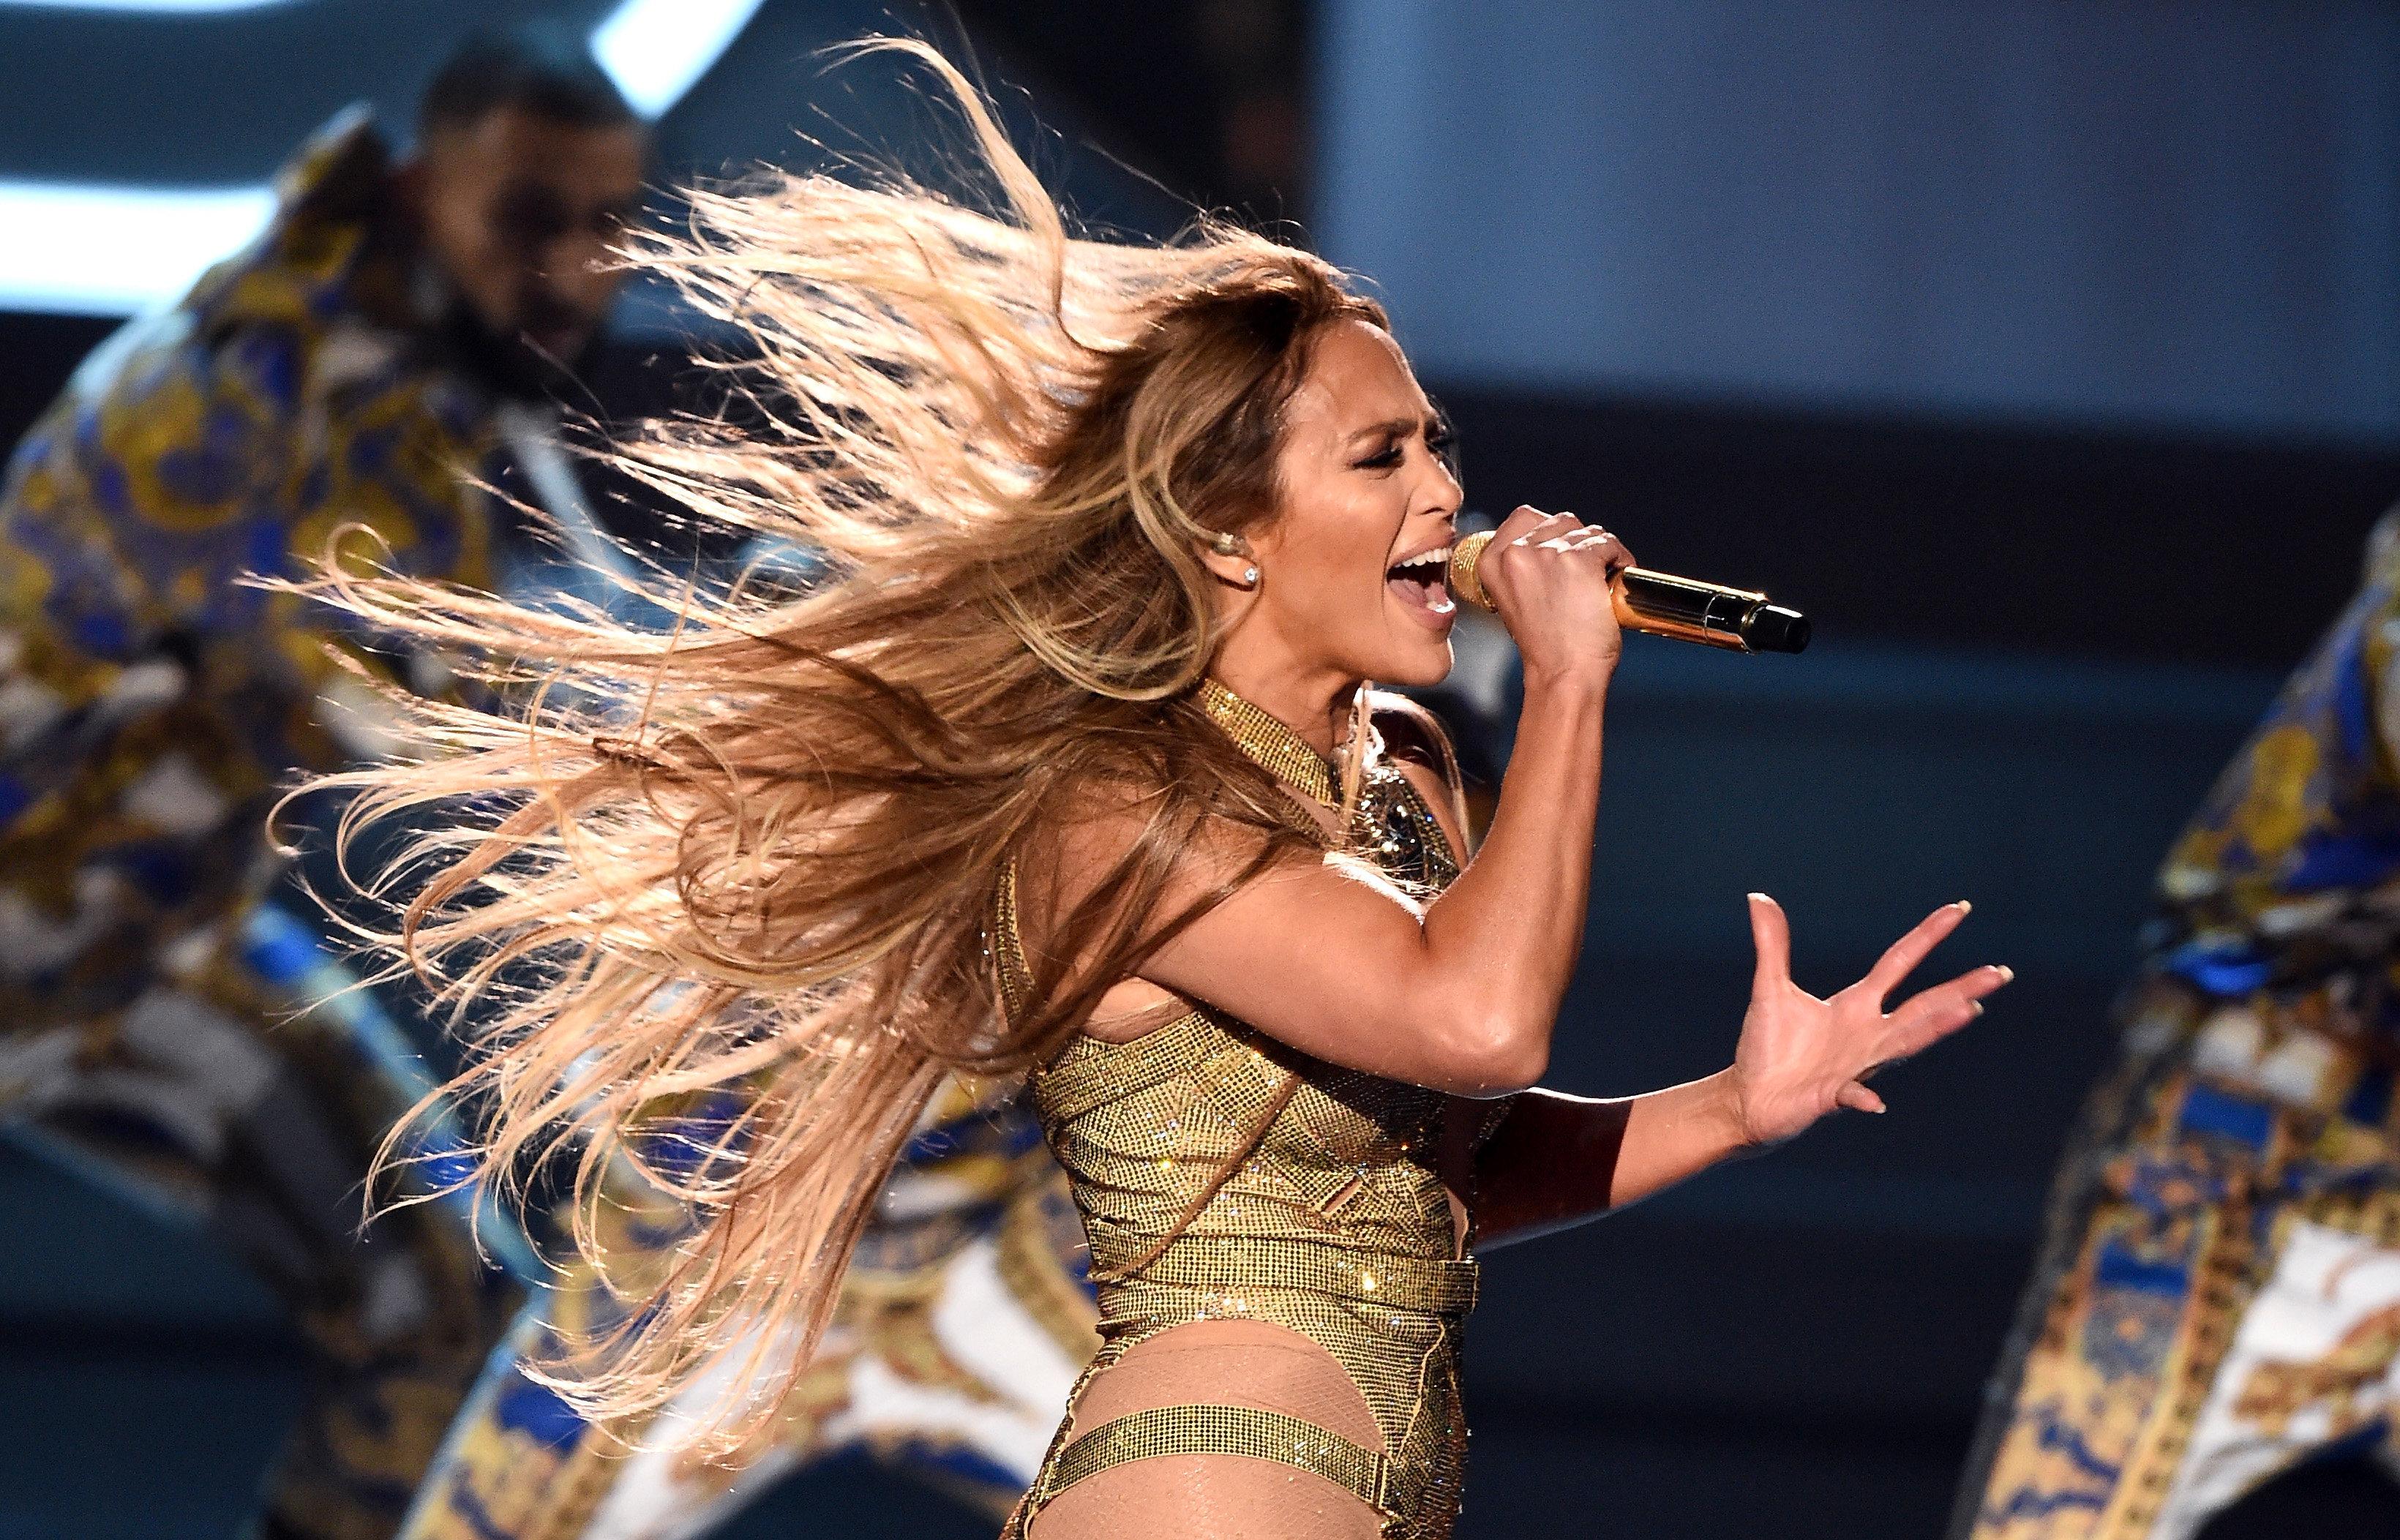 Jennifer Lopez Shuts Down The VMAs With Vanguard Award